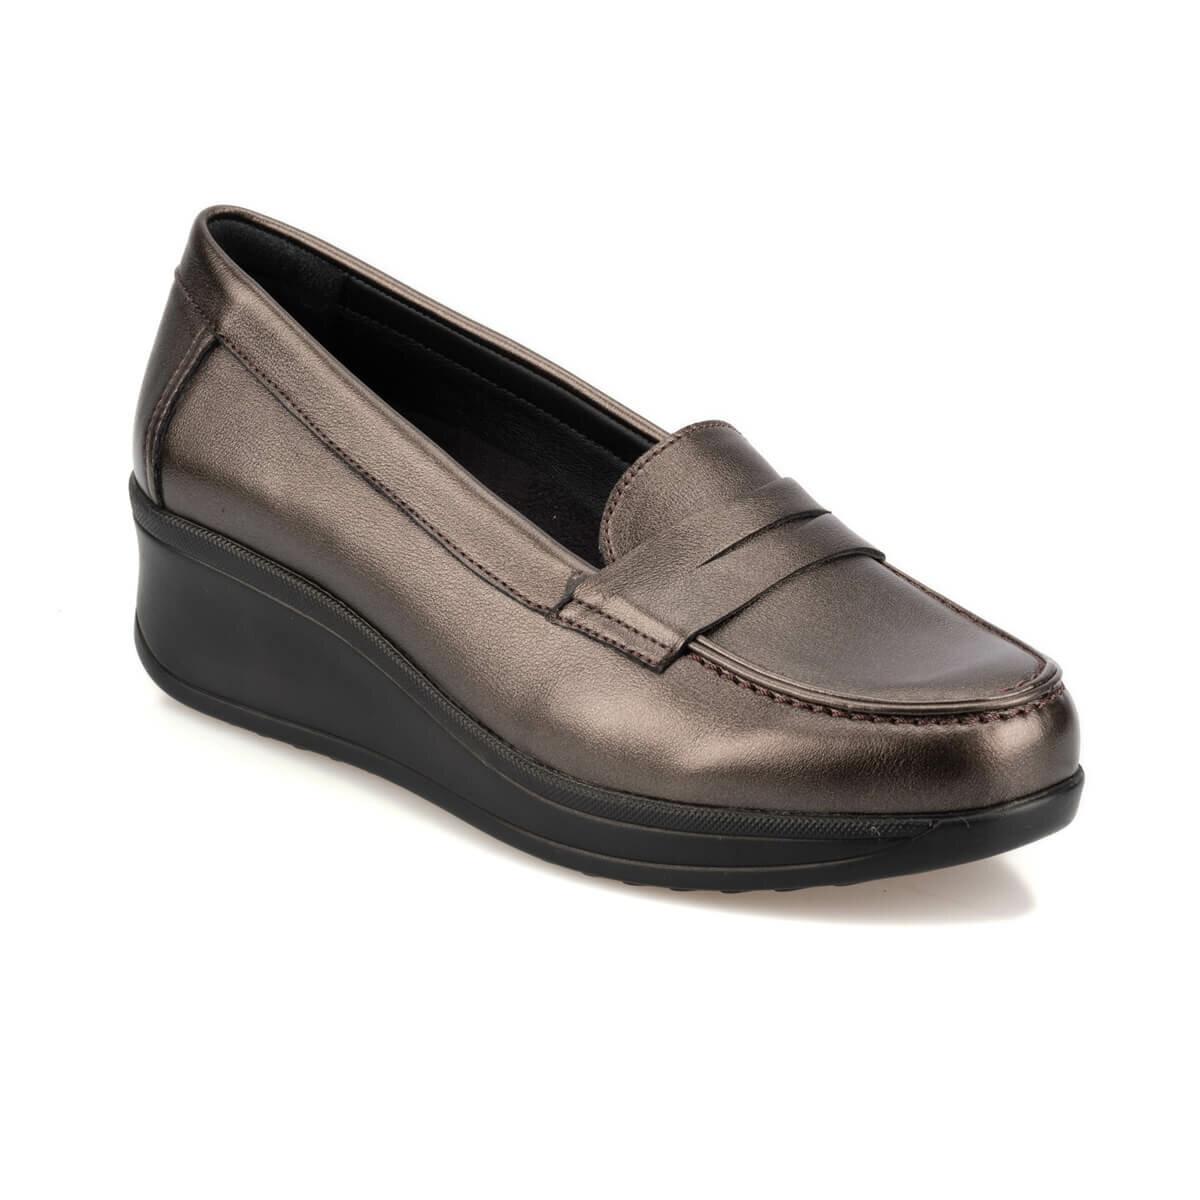 FLO TRV920054 Anthracite Women Loafer Shoes Travel Soft